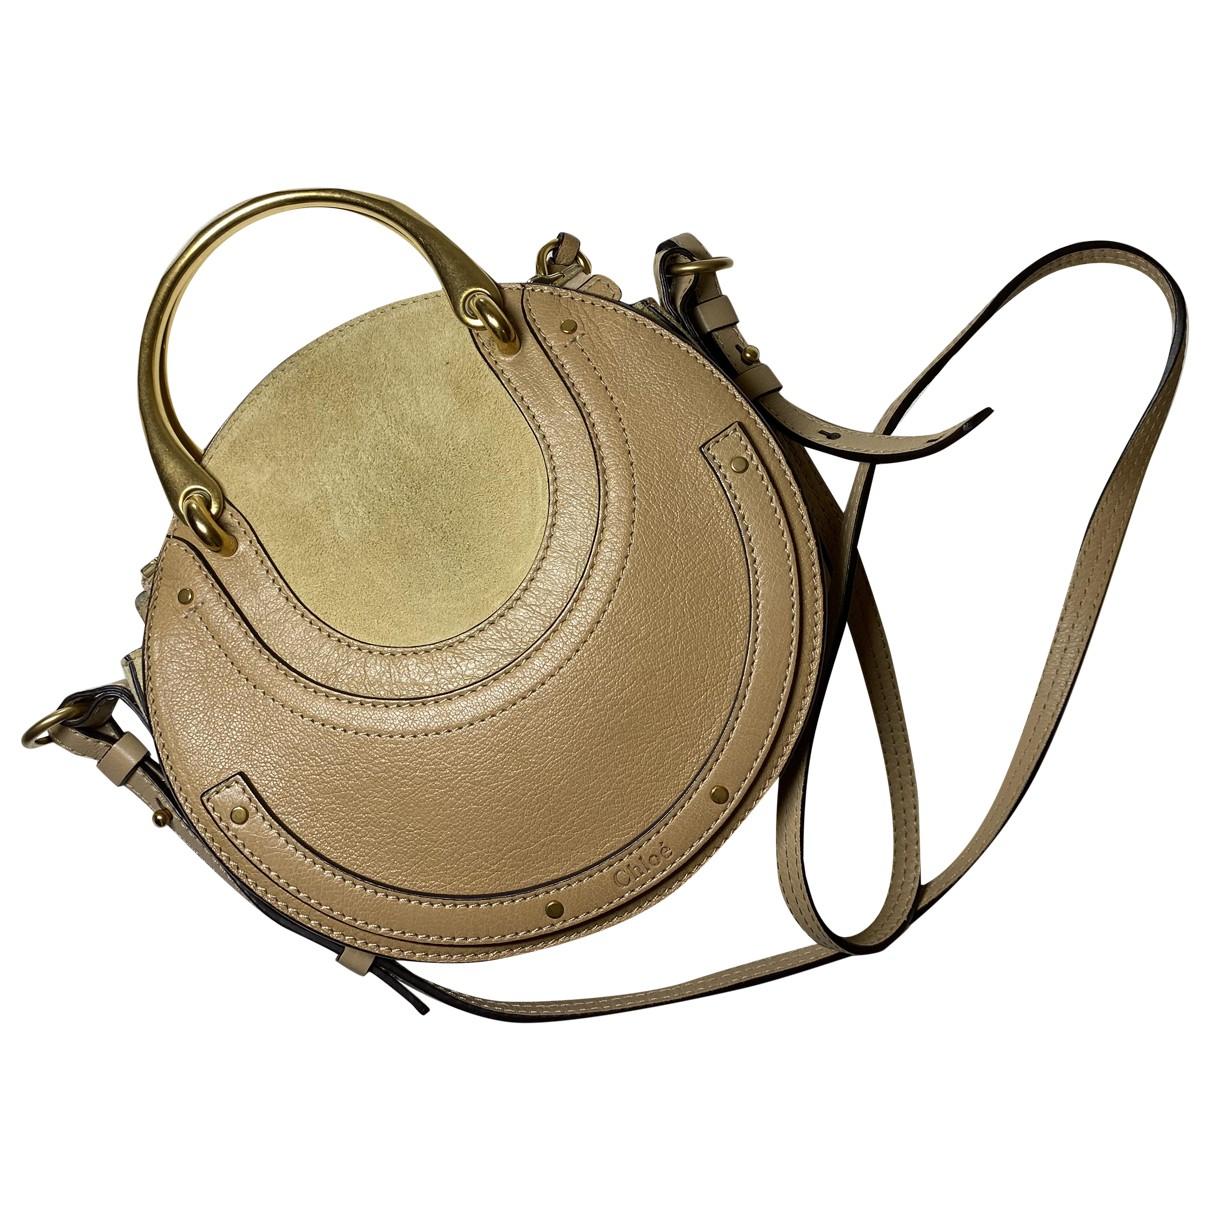 Chloe Pixie Handtasche in  Beige Leder